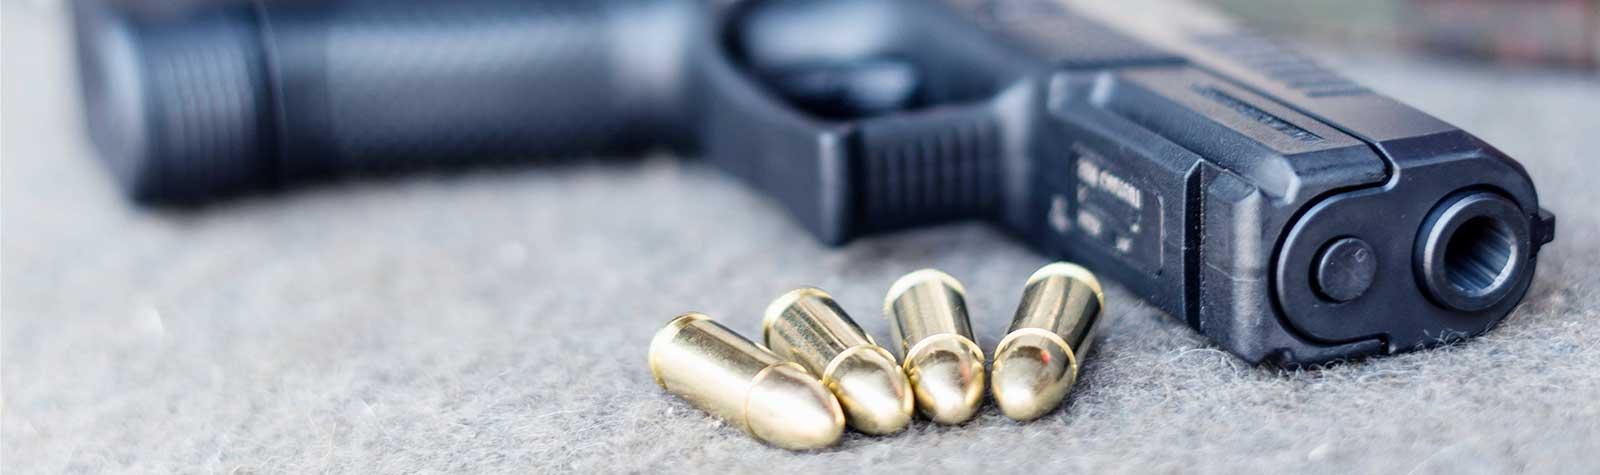 Best airsoft pistol | Review from An Expert